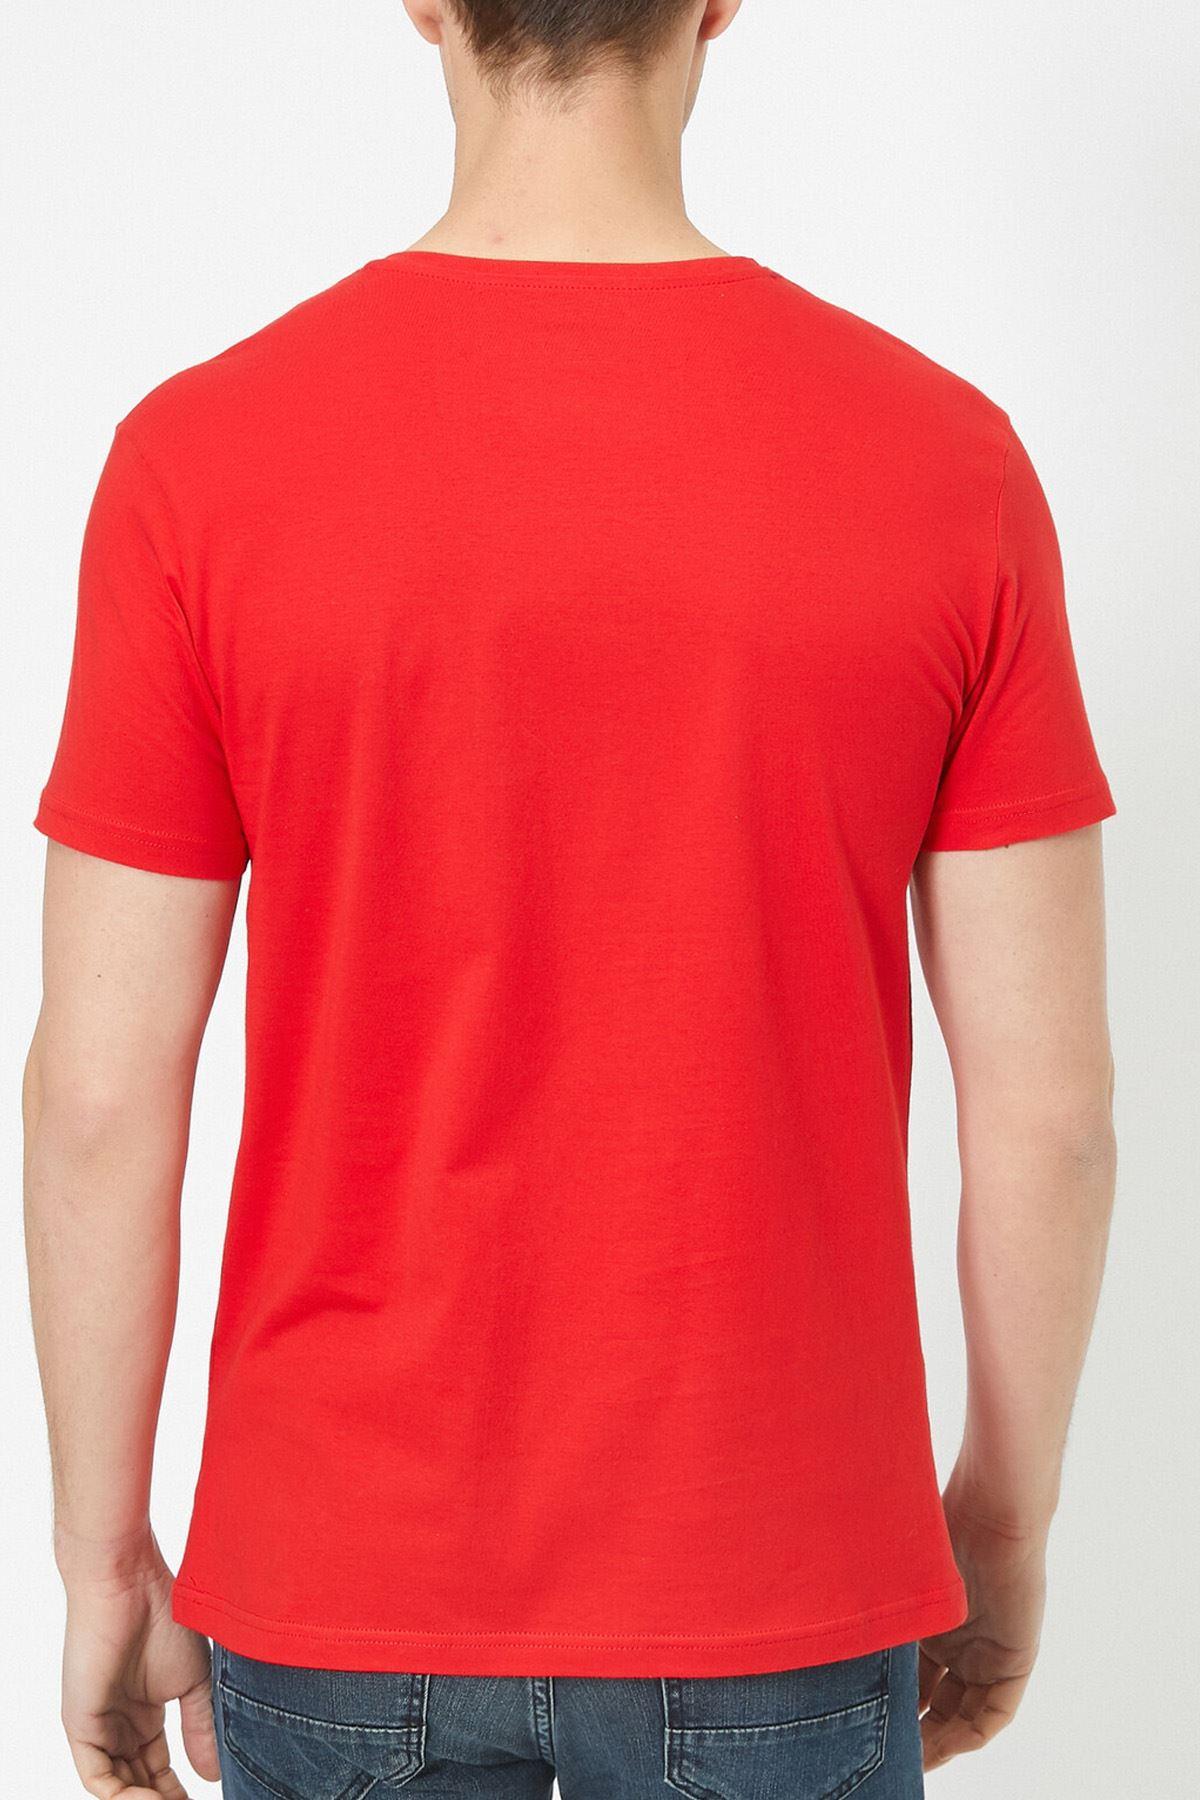 Anime Death Note 07 Kırmızı Erkek Tshirt - Tişört